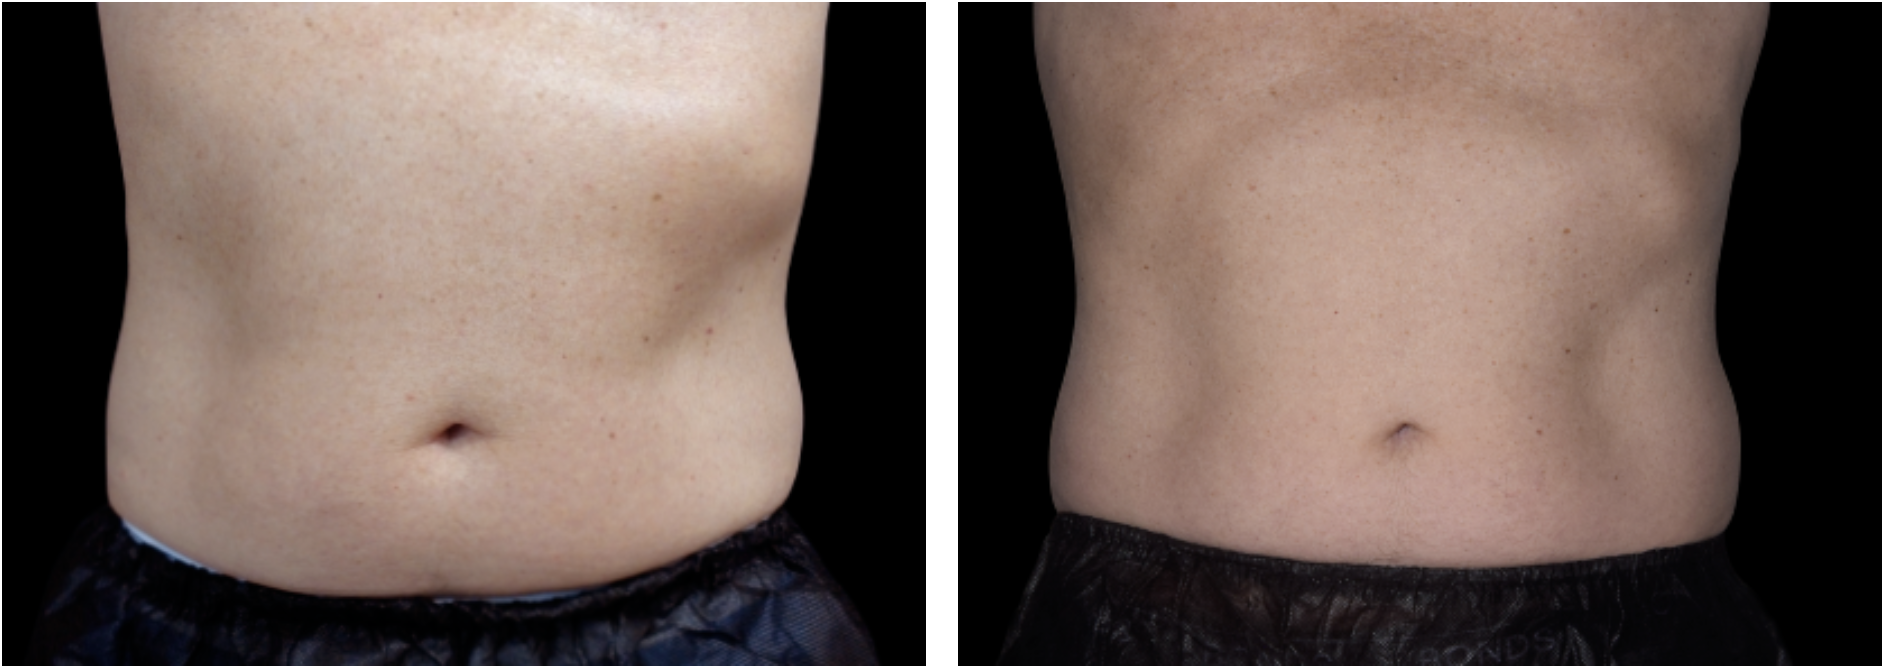 prima e dopo emsculpt dottoressa pozzuoli torino